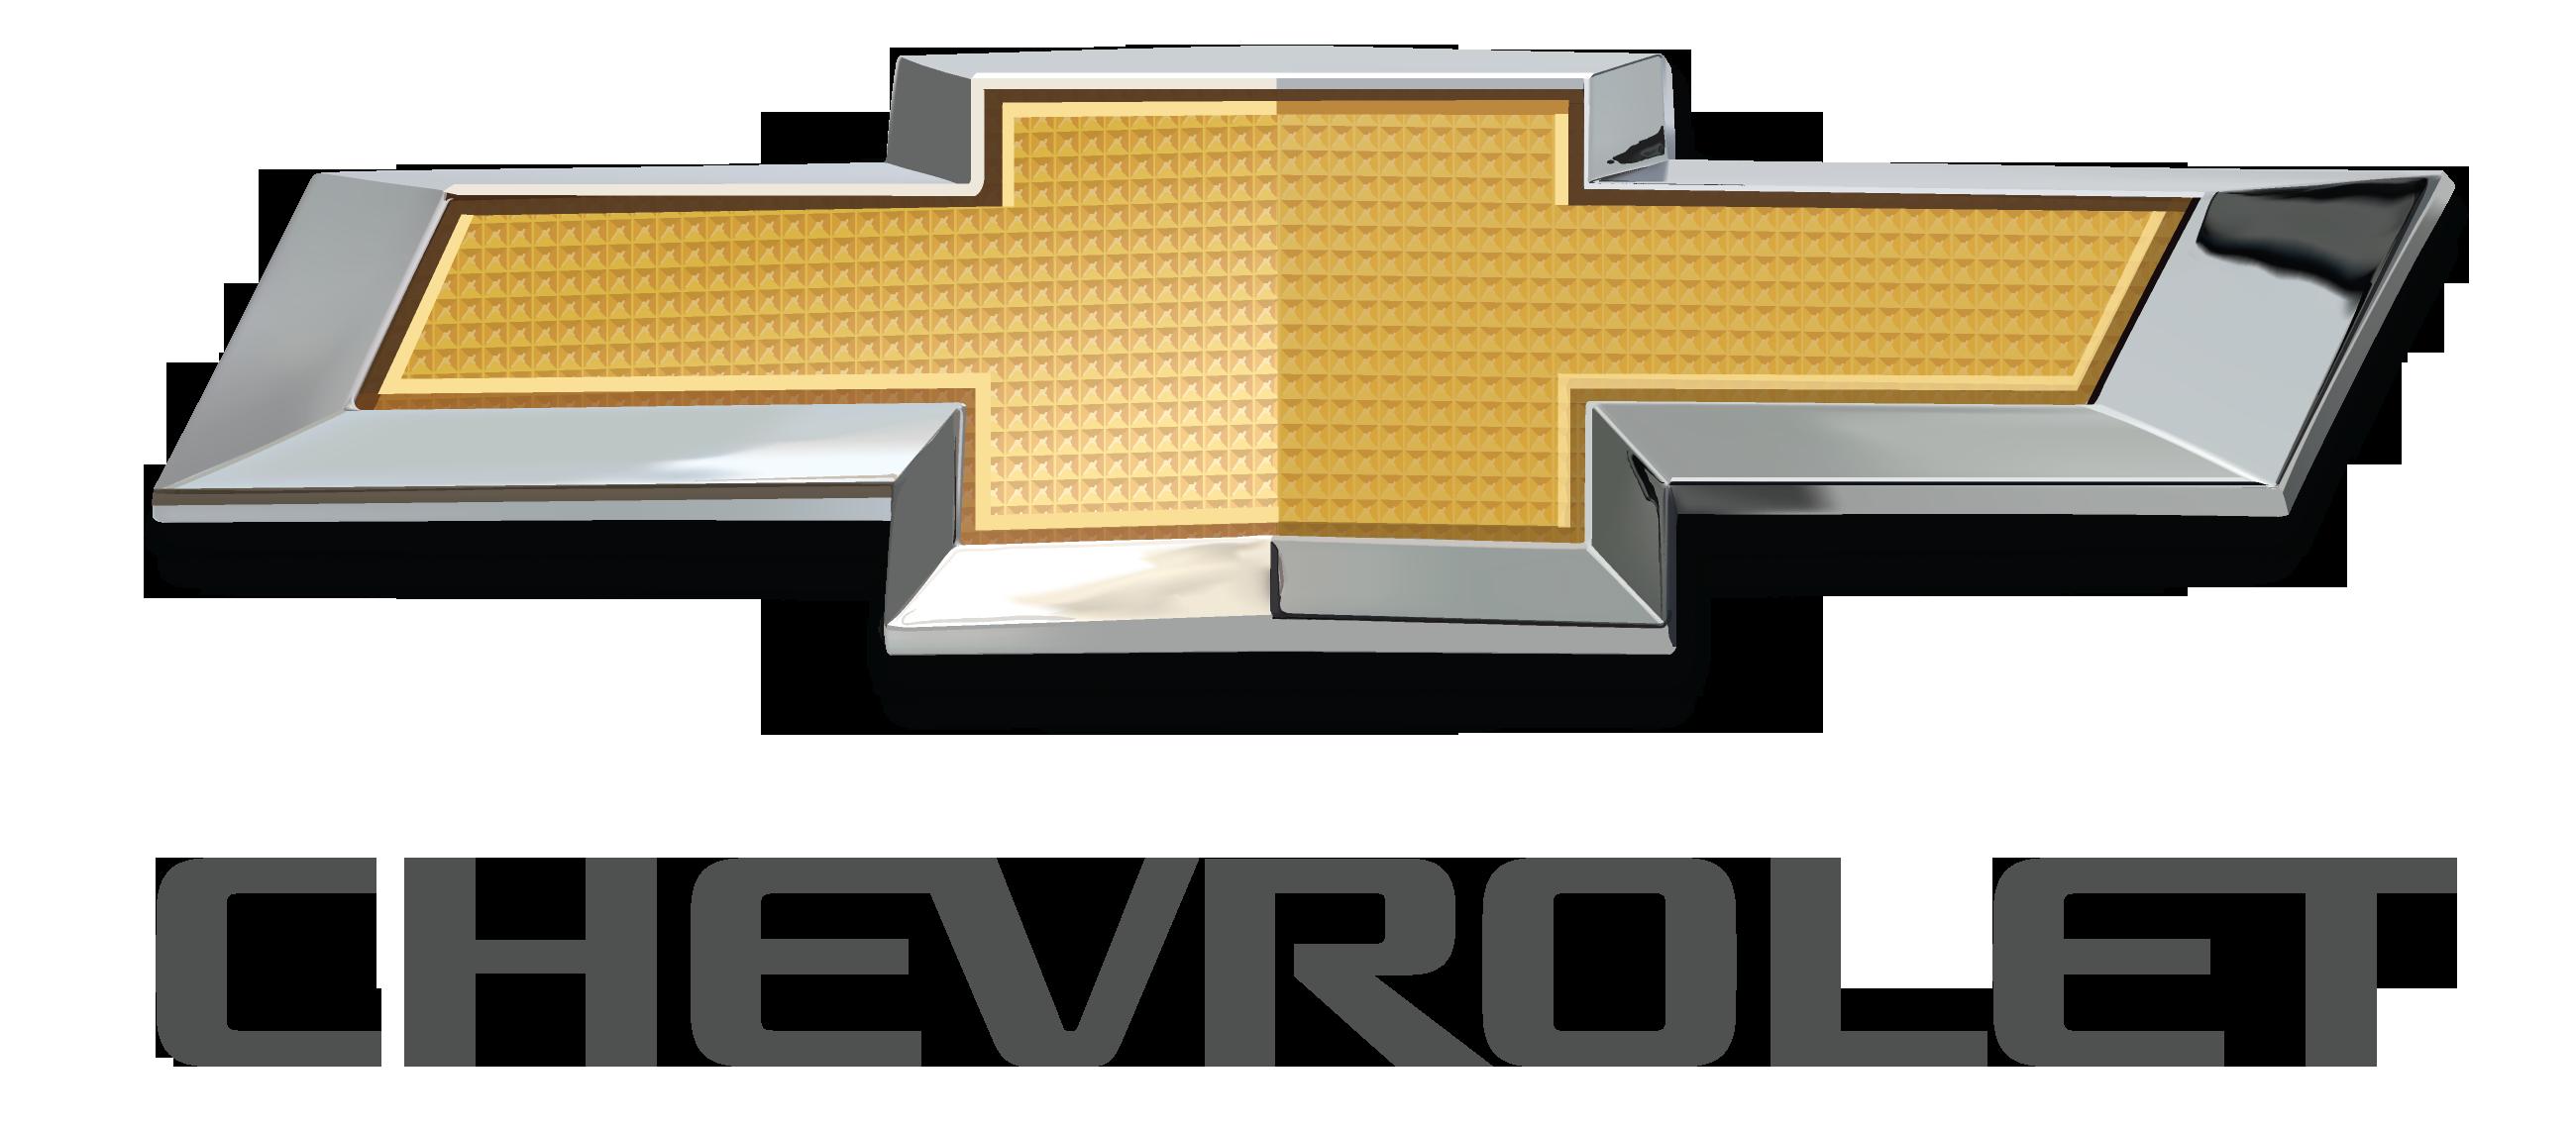 Americanchevroletcarlogodownload Chevrolet